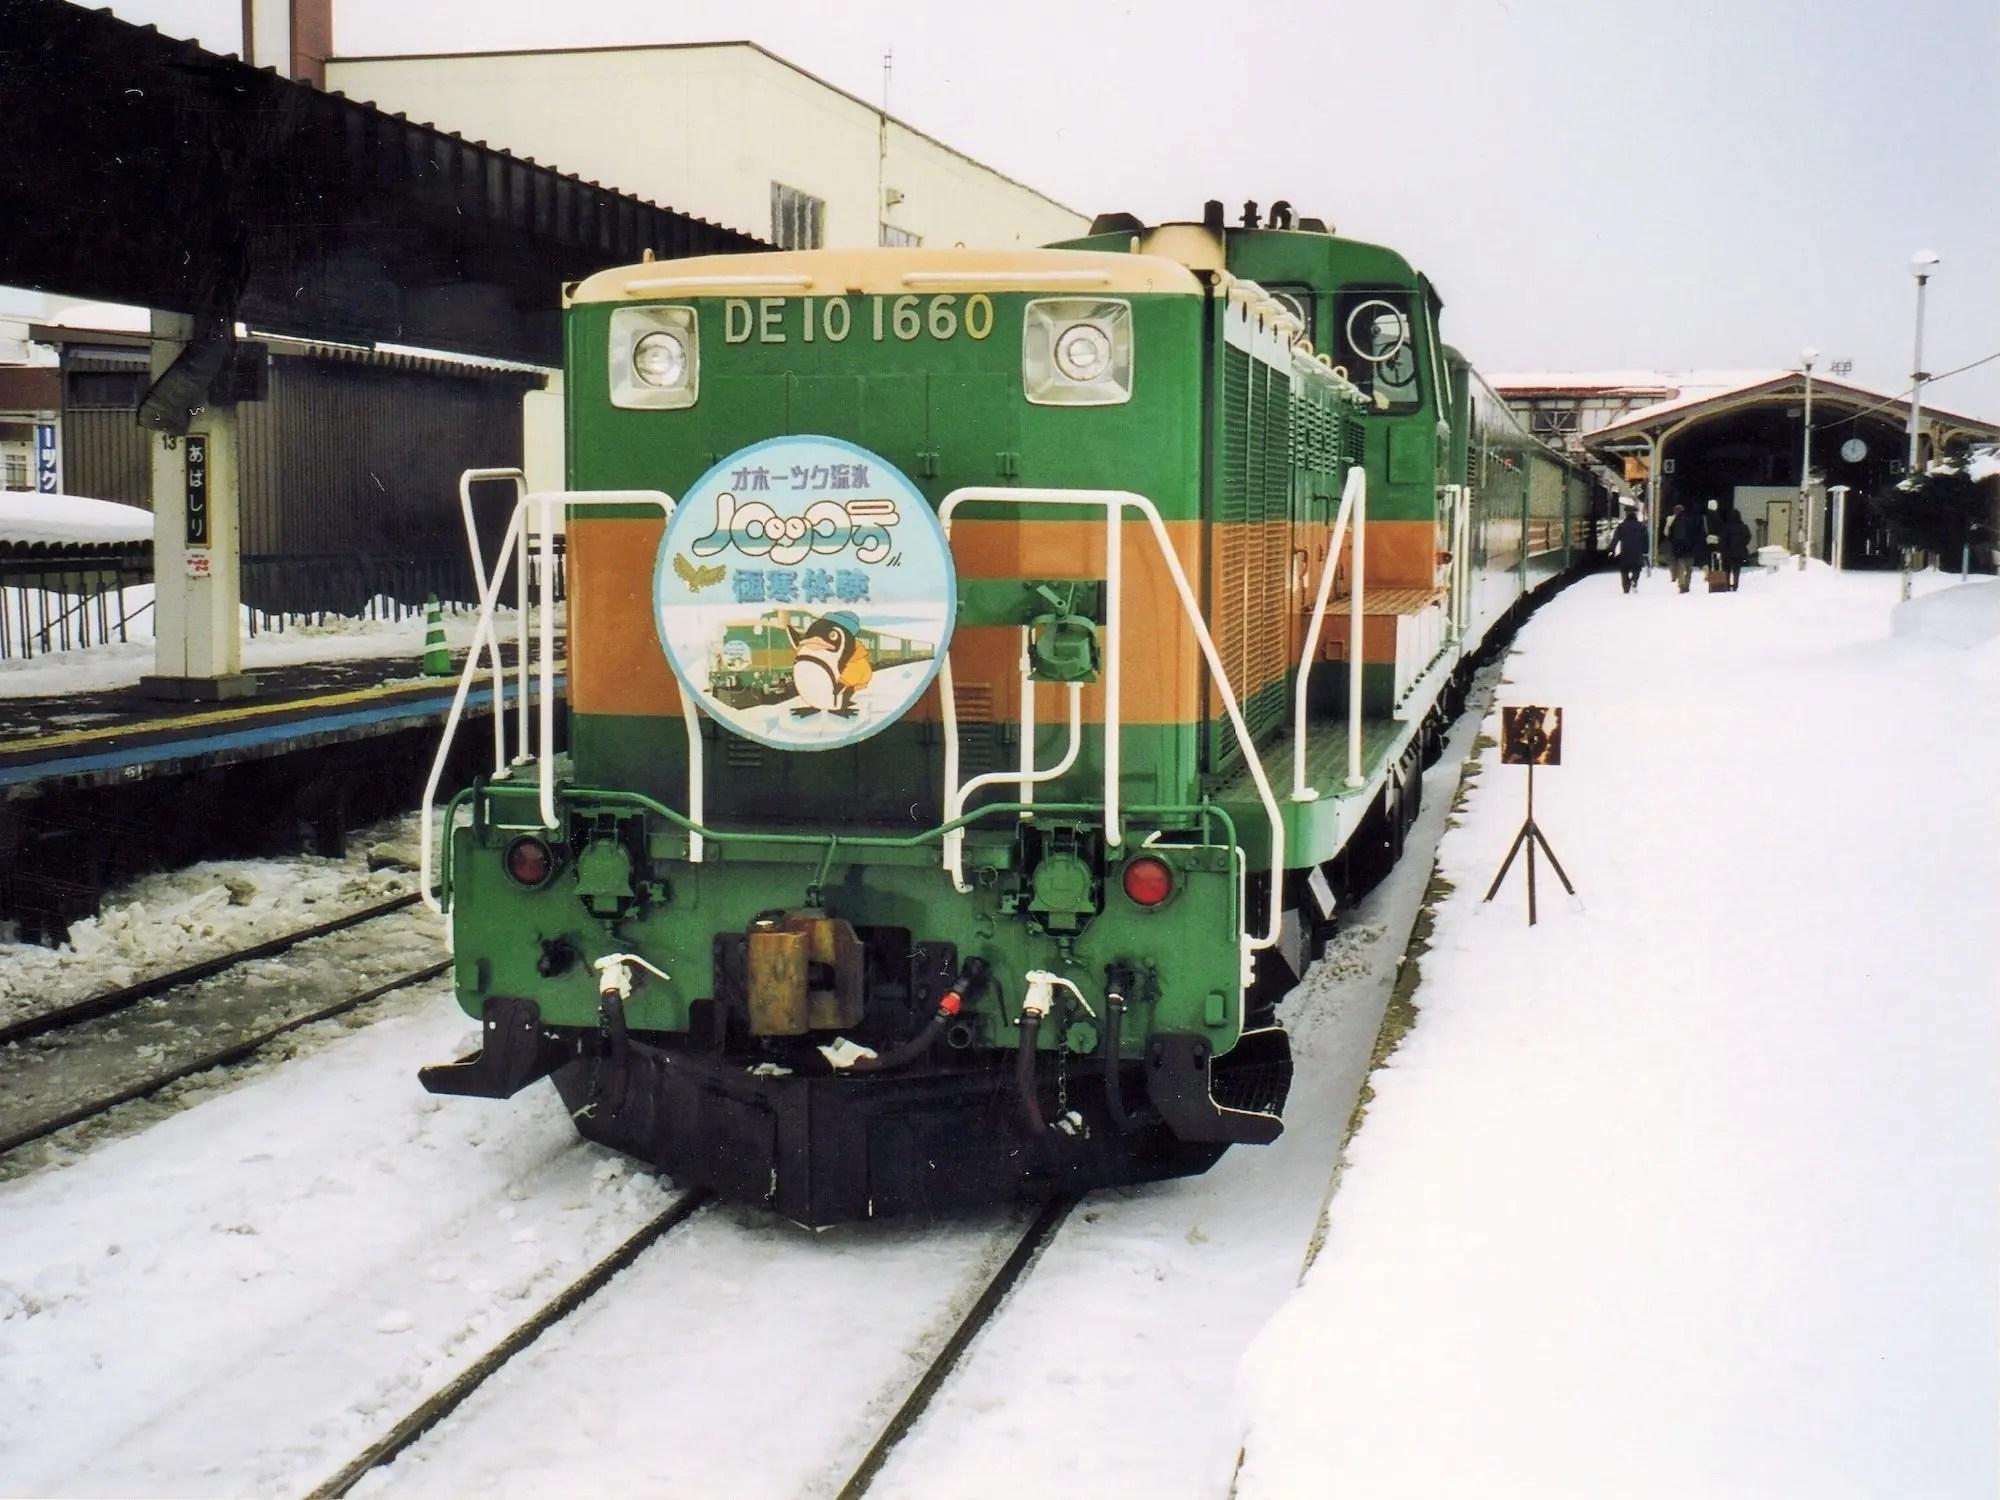 Shiretoko-Shari Station